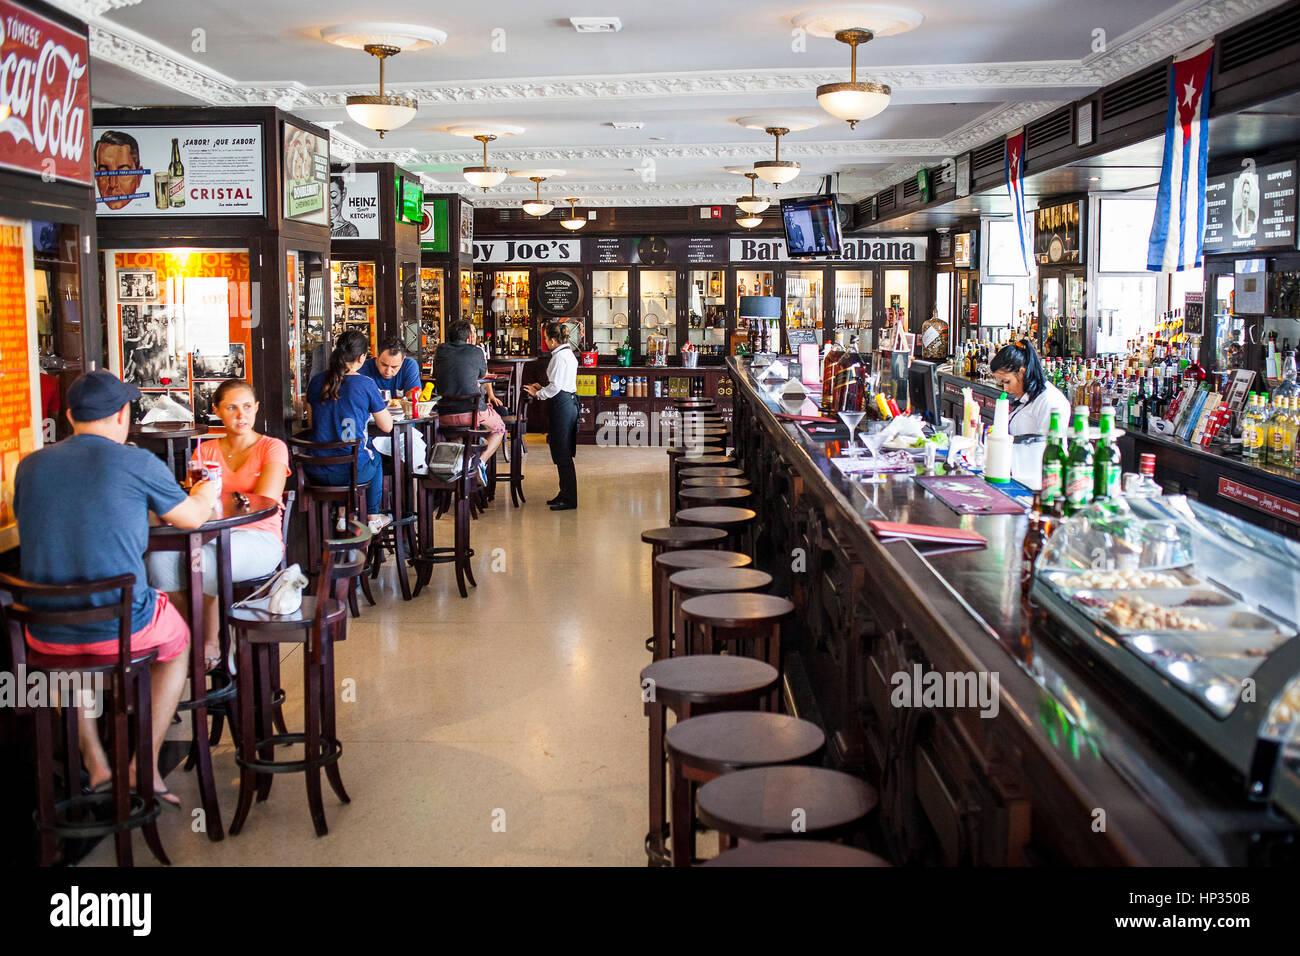 Sloppy Joe's Bar, is a a historic bar, La Habana, Cuba - Stock Image